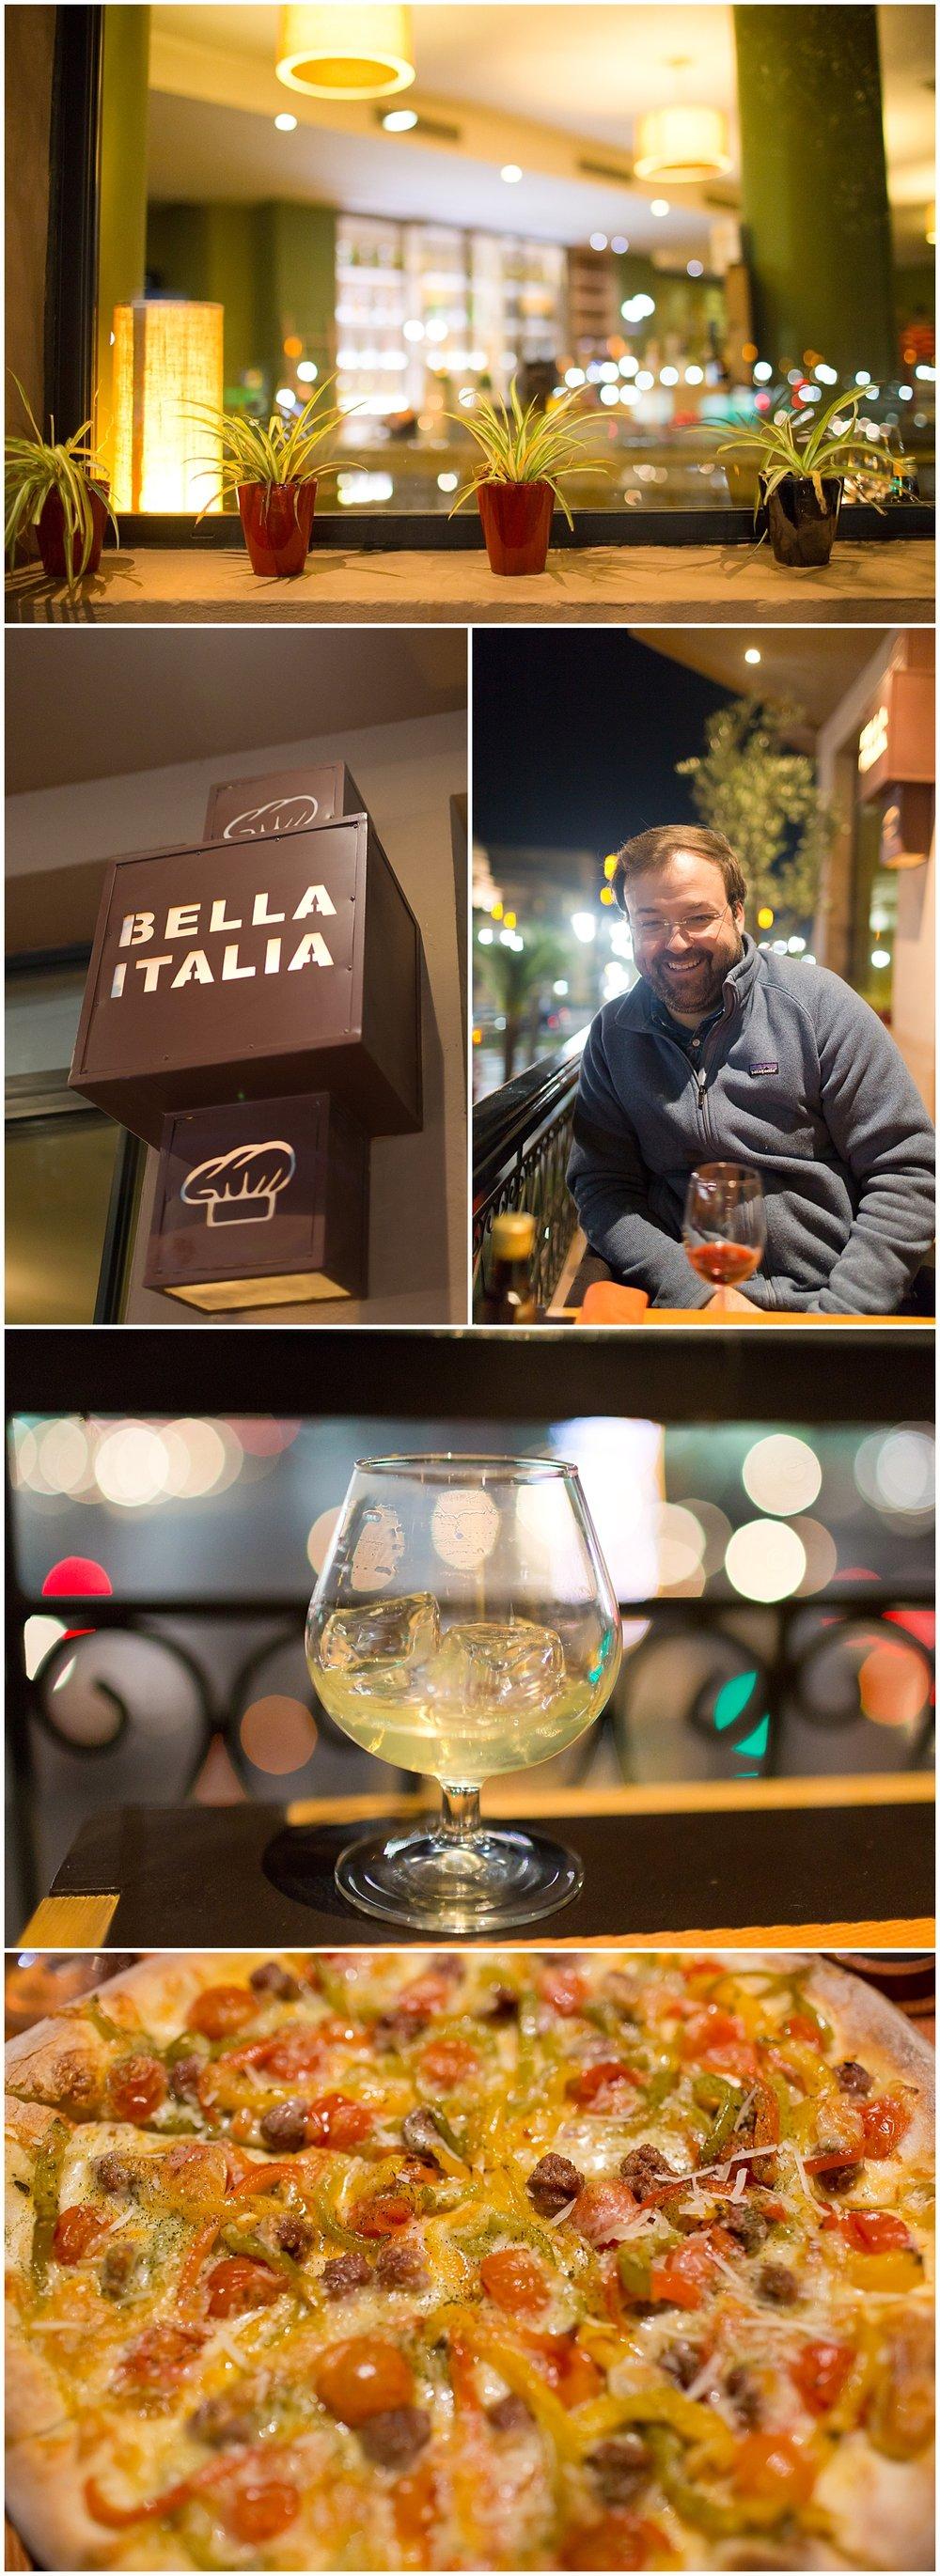 Bella Italia pizza restaurant in Ville Nouvelle, Marrakech